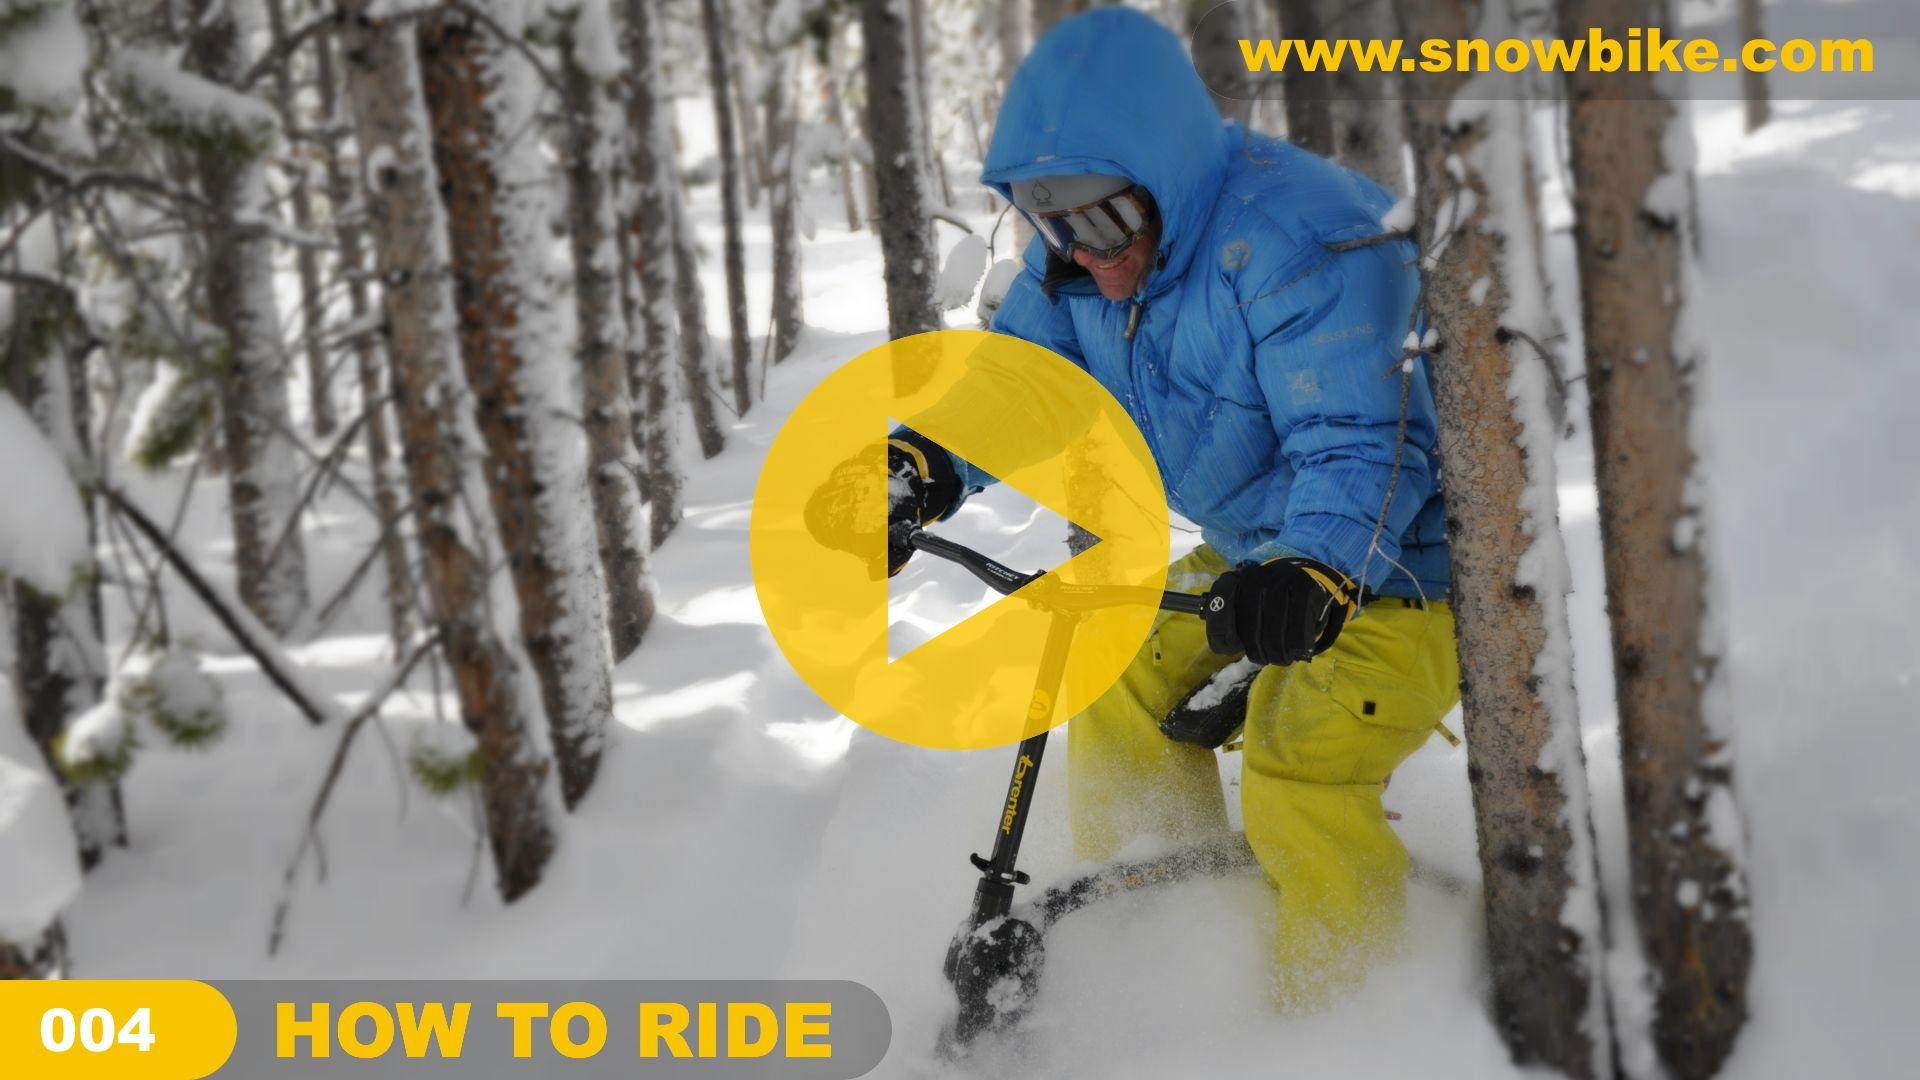 snowbike-brenter-lesson-cover1808629D-05AF-94B1-A67E-FDB2BC9CE1AD.jpg